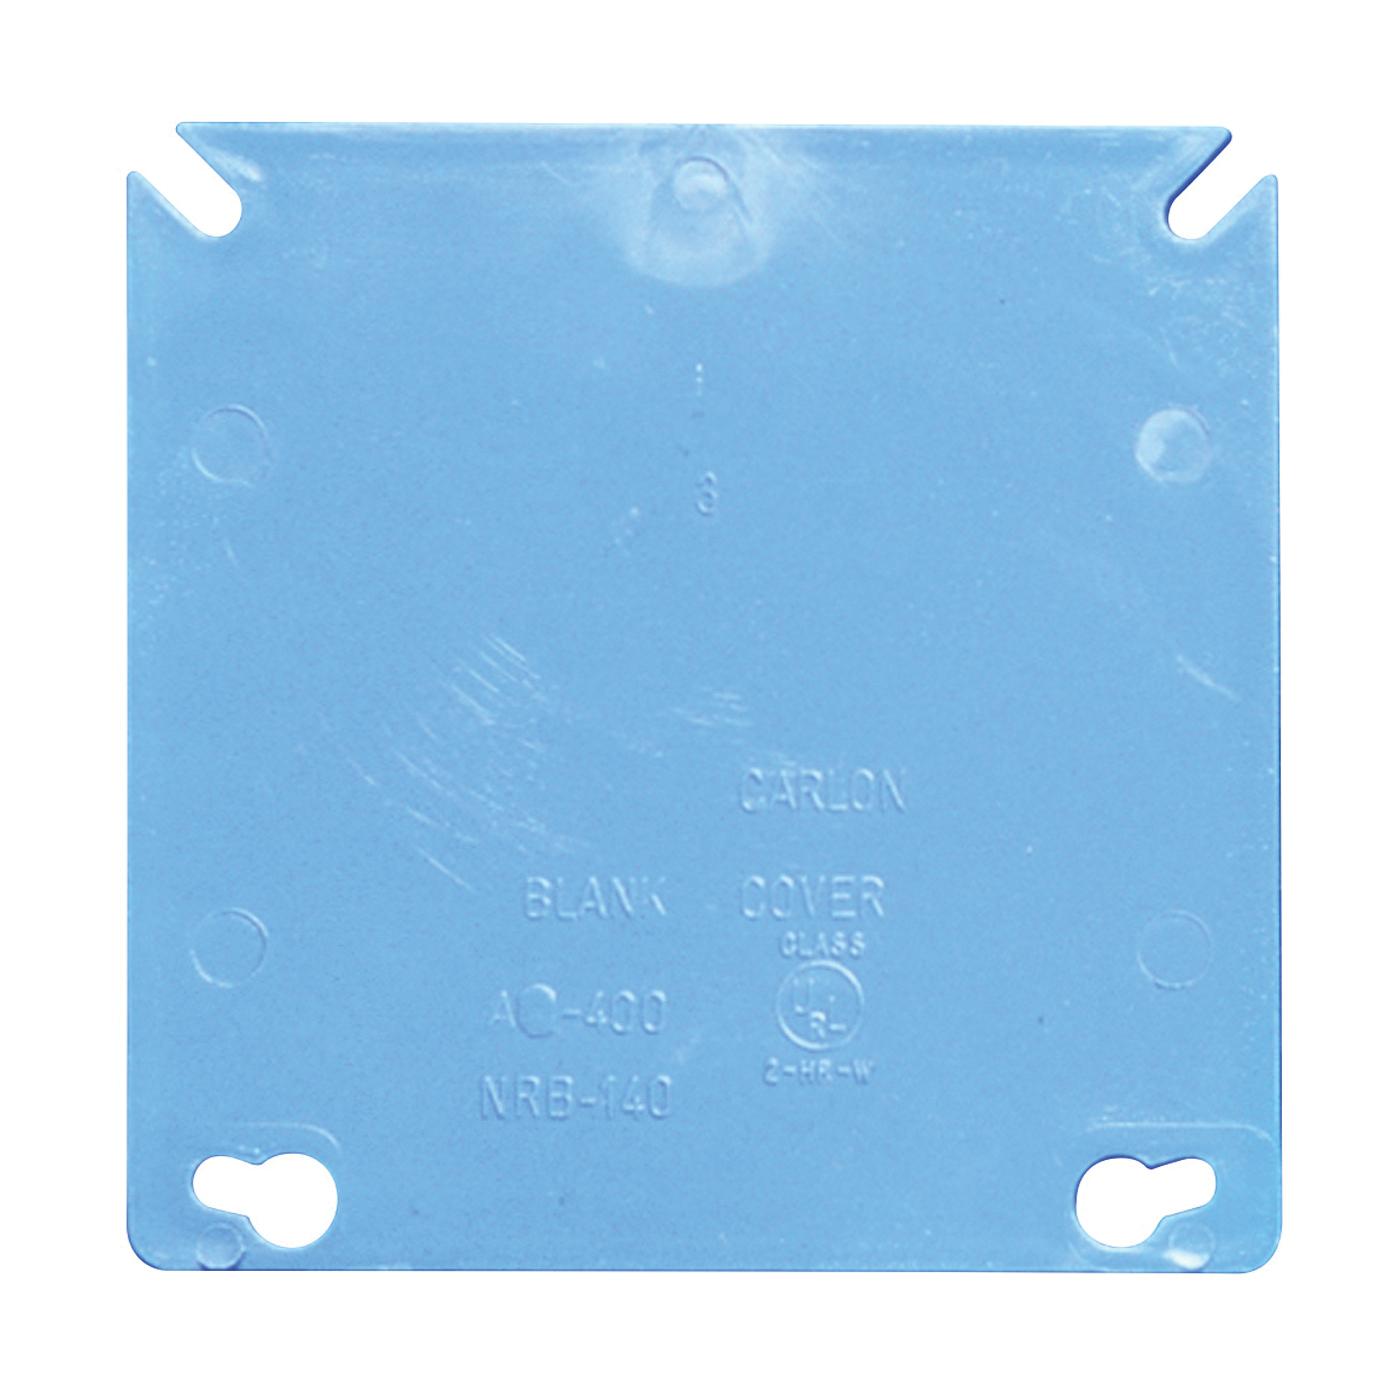 Picture of Carlon A400R-CAR Electrical Box Cover, 4 in L, 4 in W, Square, PVC, Blue